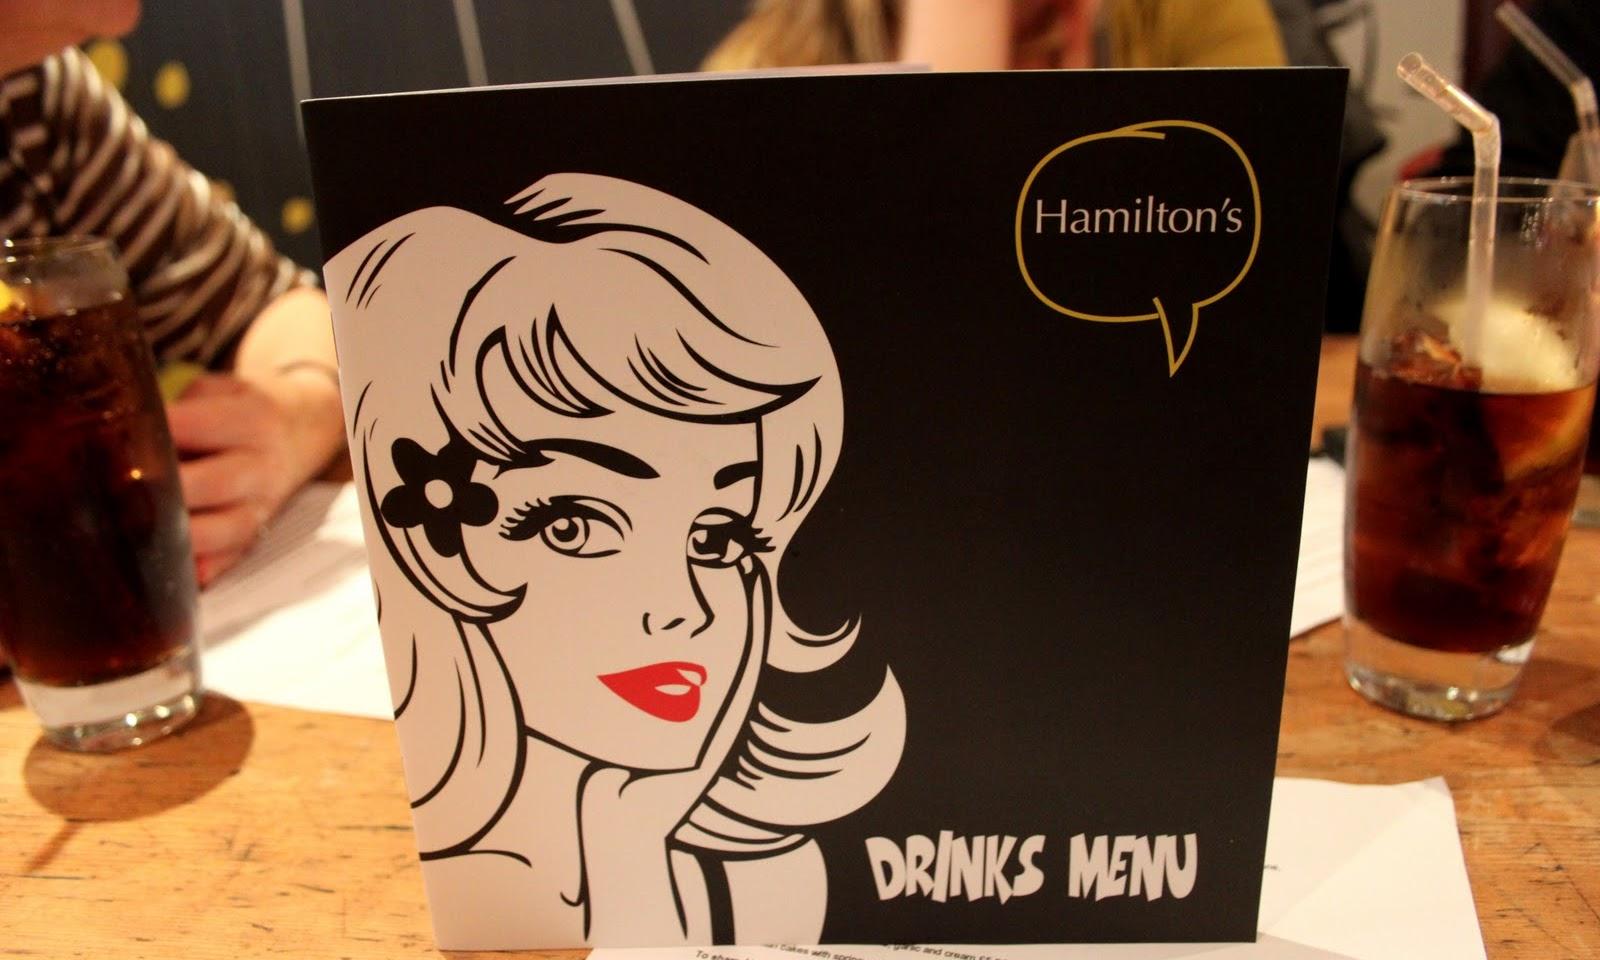 Hamilton's